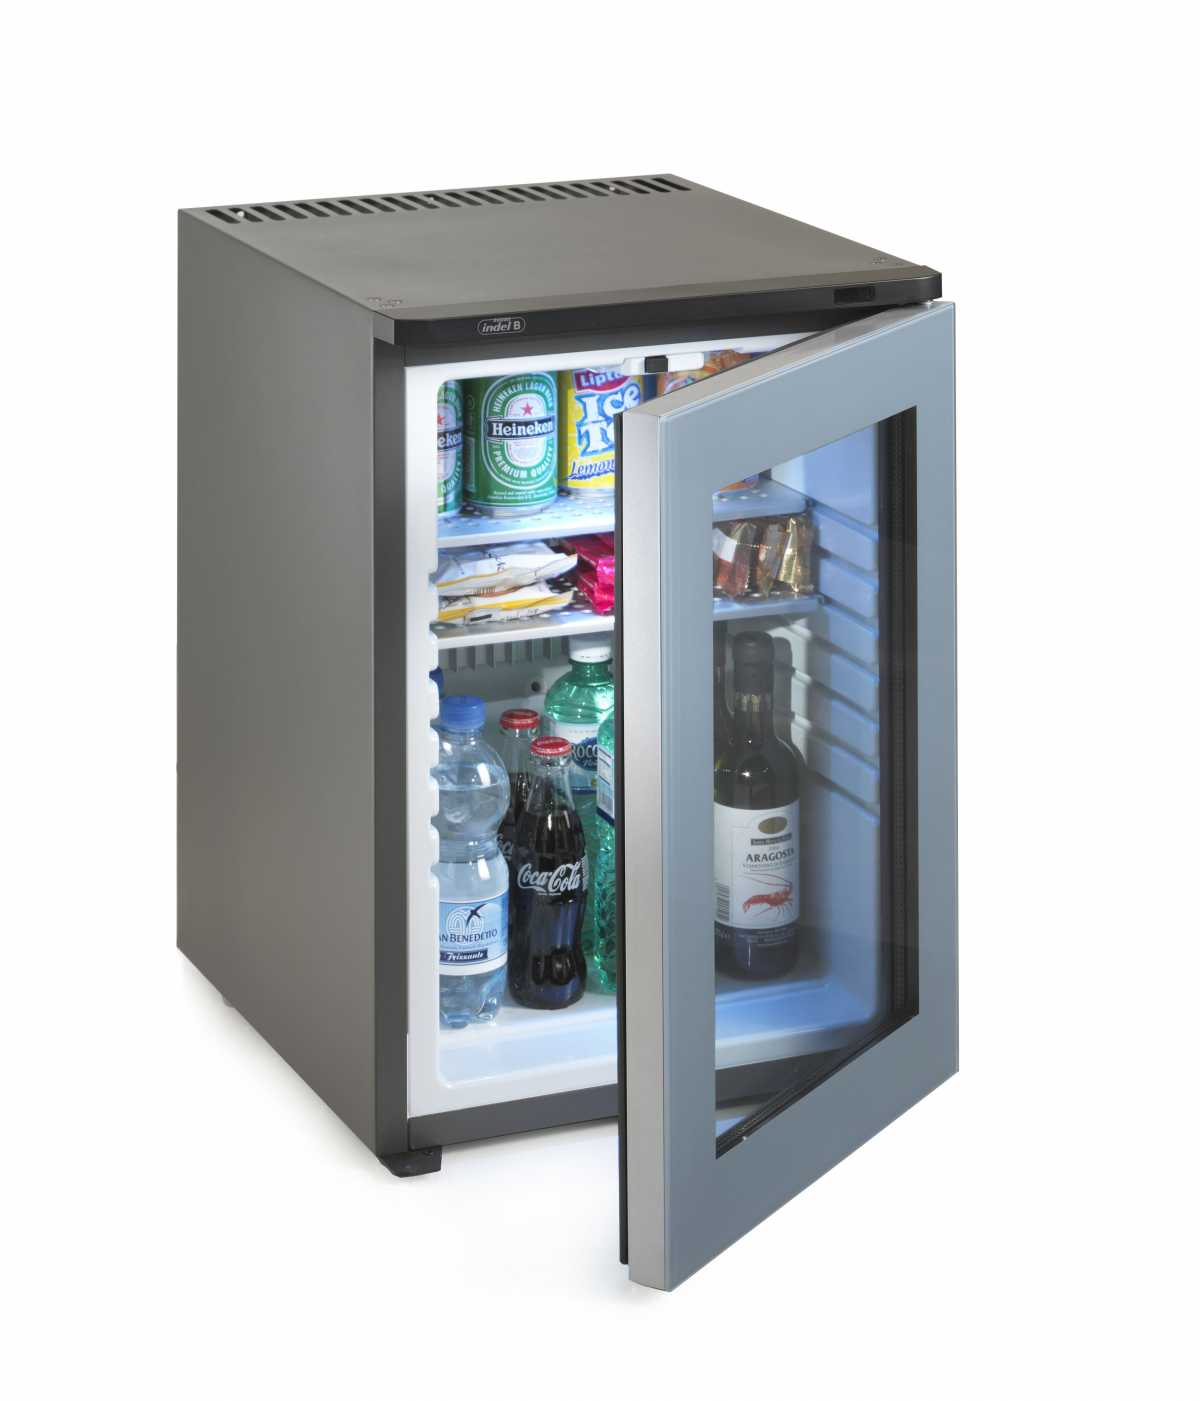 INDEL B Drink 40 Plus PV Cam Kapılı Minibar